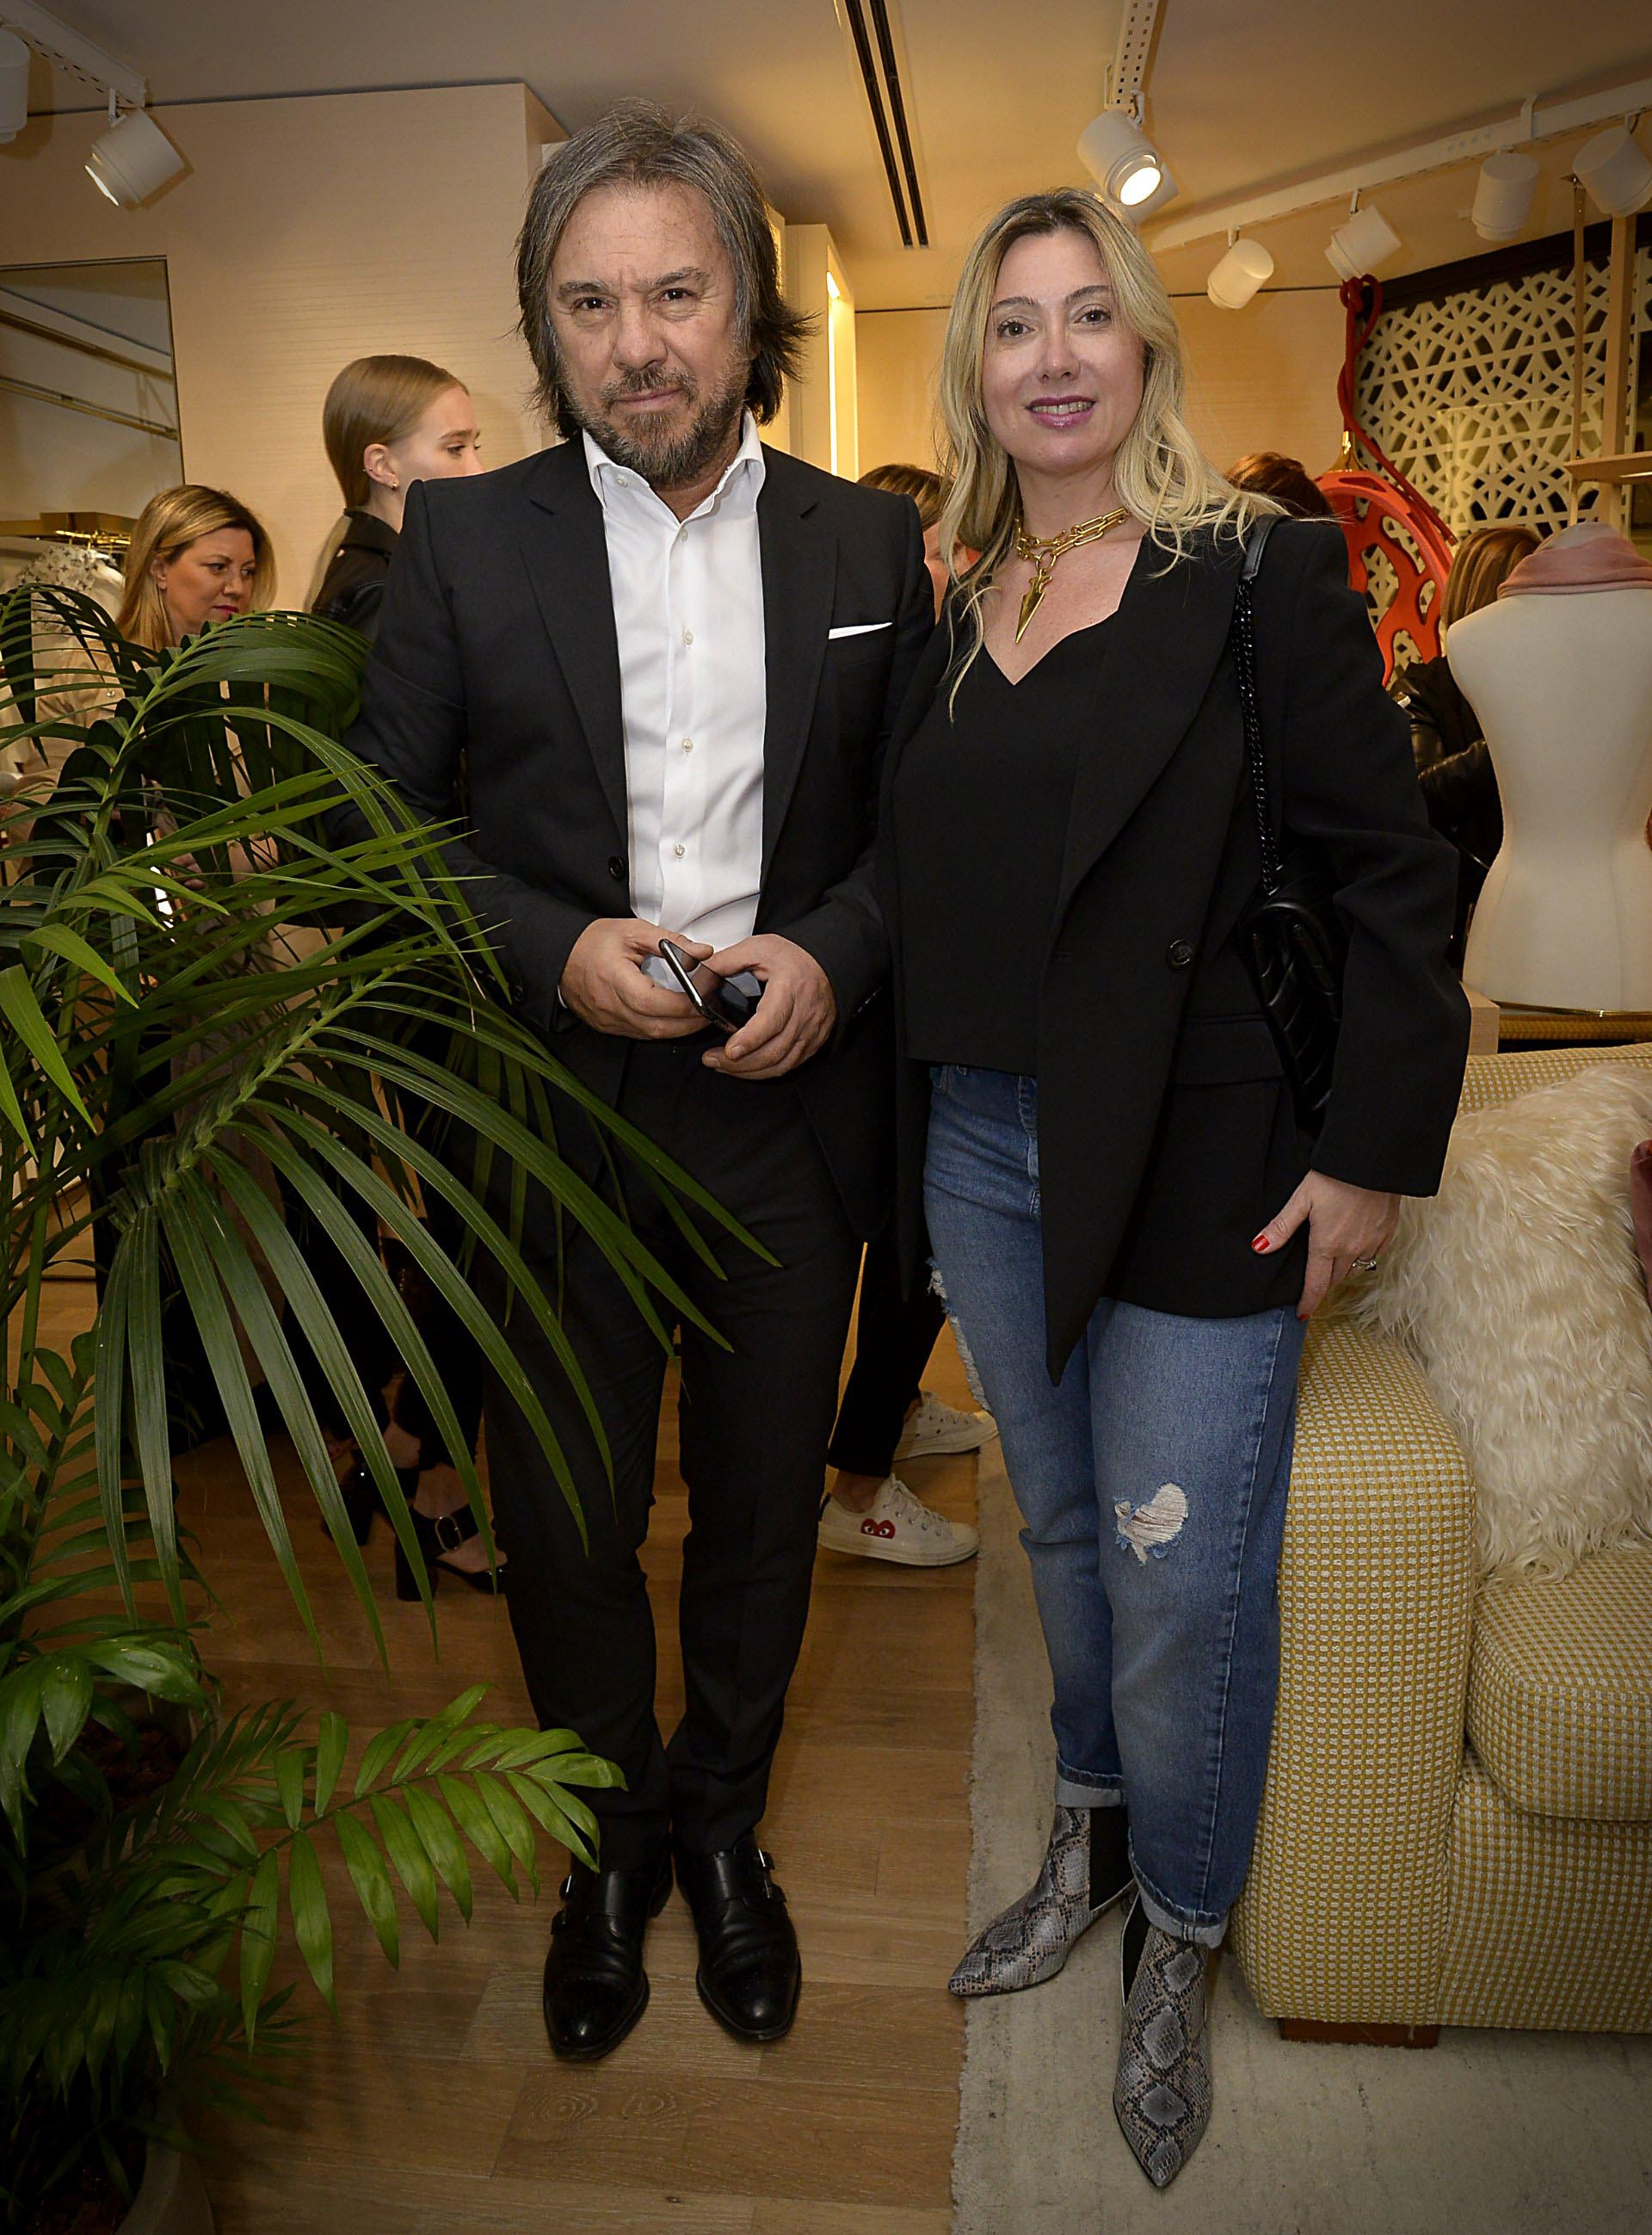 Claudio Cerini y Karina Davicco